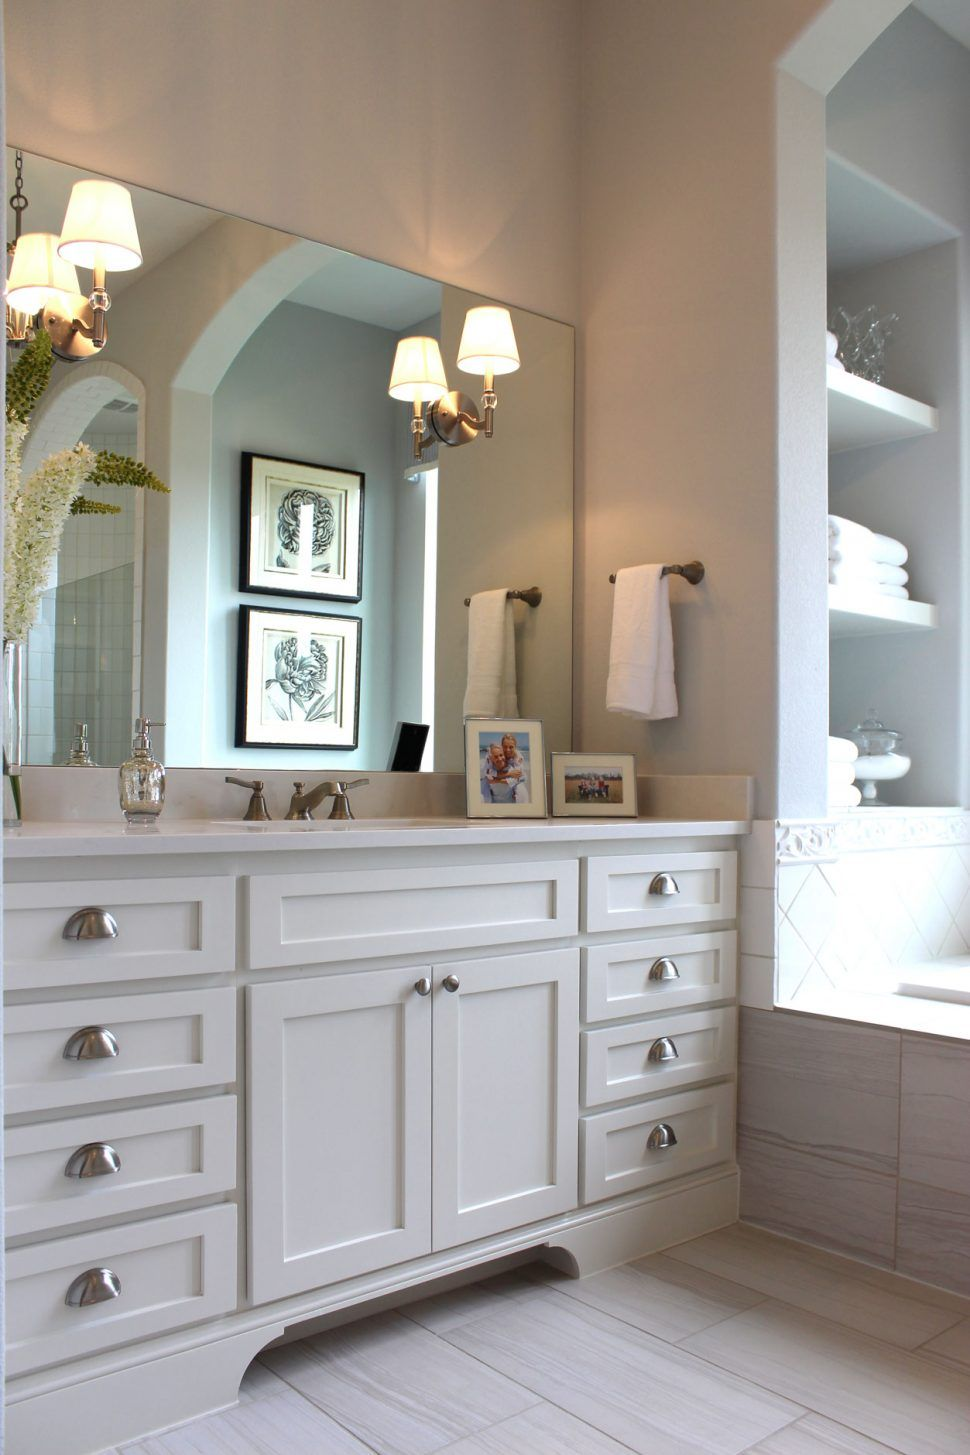 Bathrooms Design 18 Deep Bathroom Vanity White Shaker Bathroom Vanity Shaker Style Bathroom White Bathroom Cabinets White Vanity Bathroom White Master Bathroom